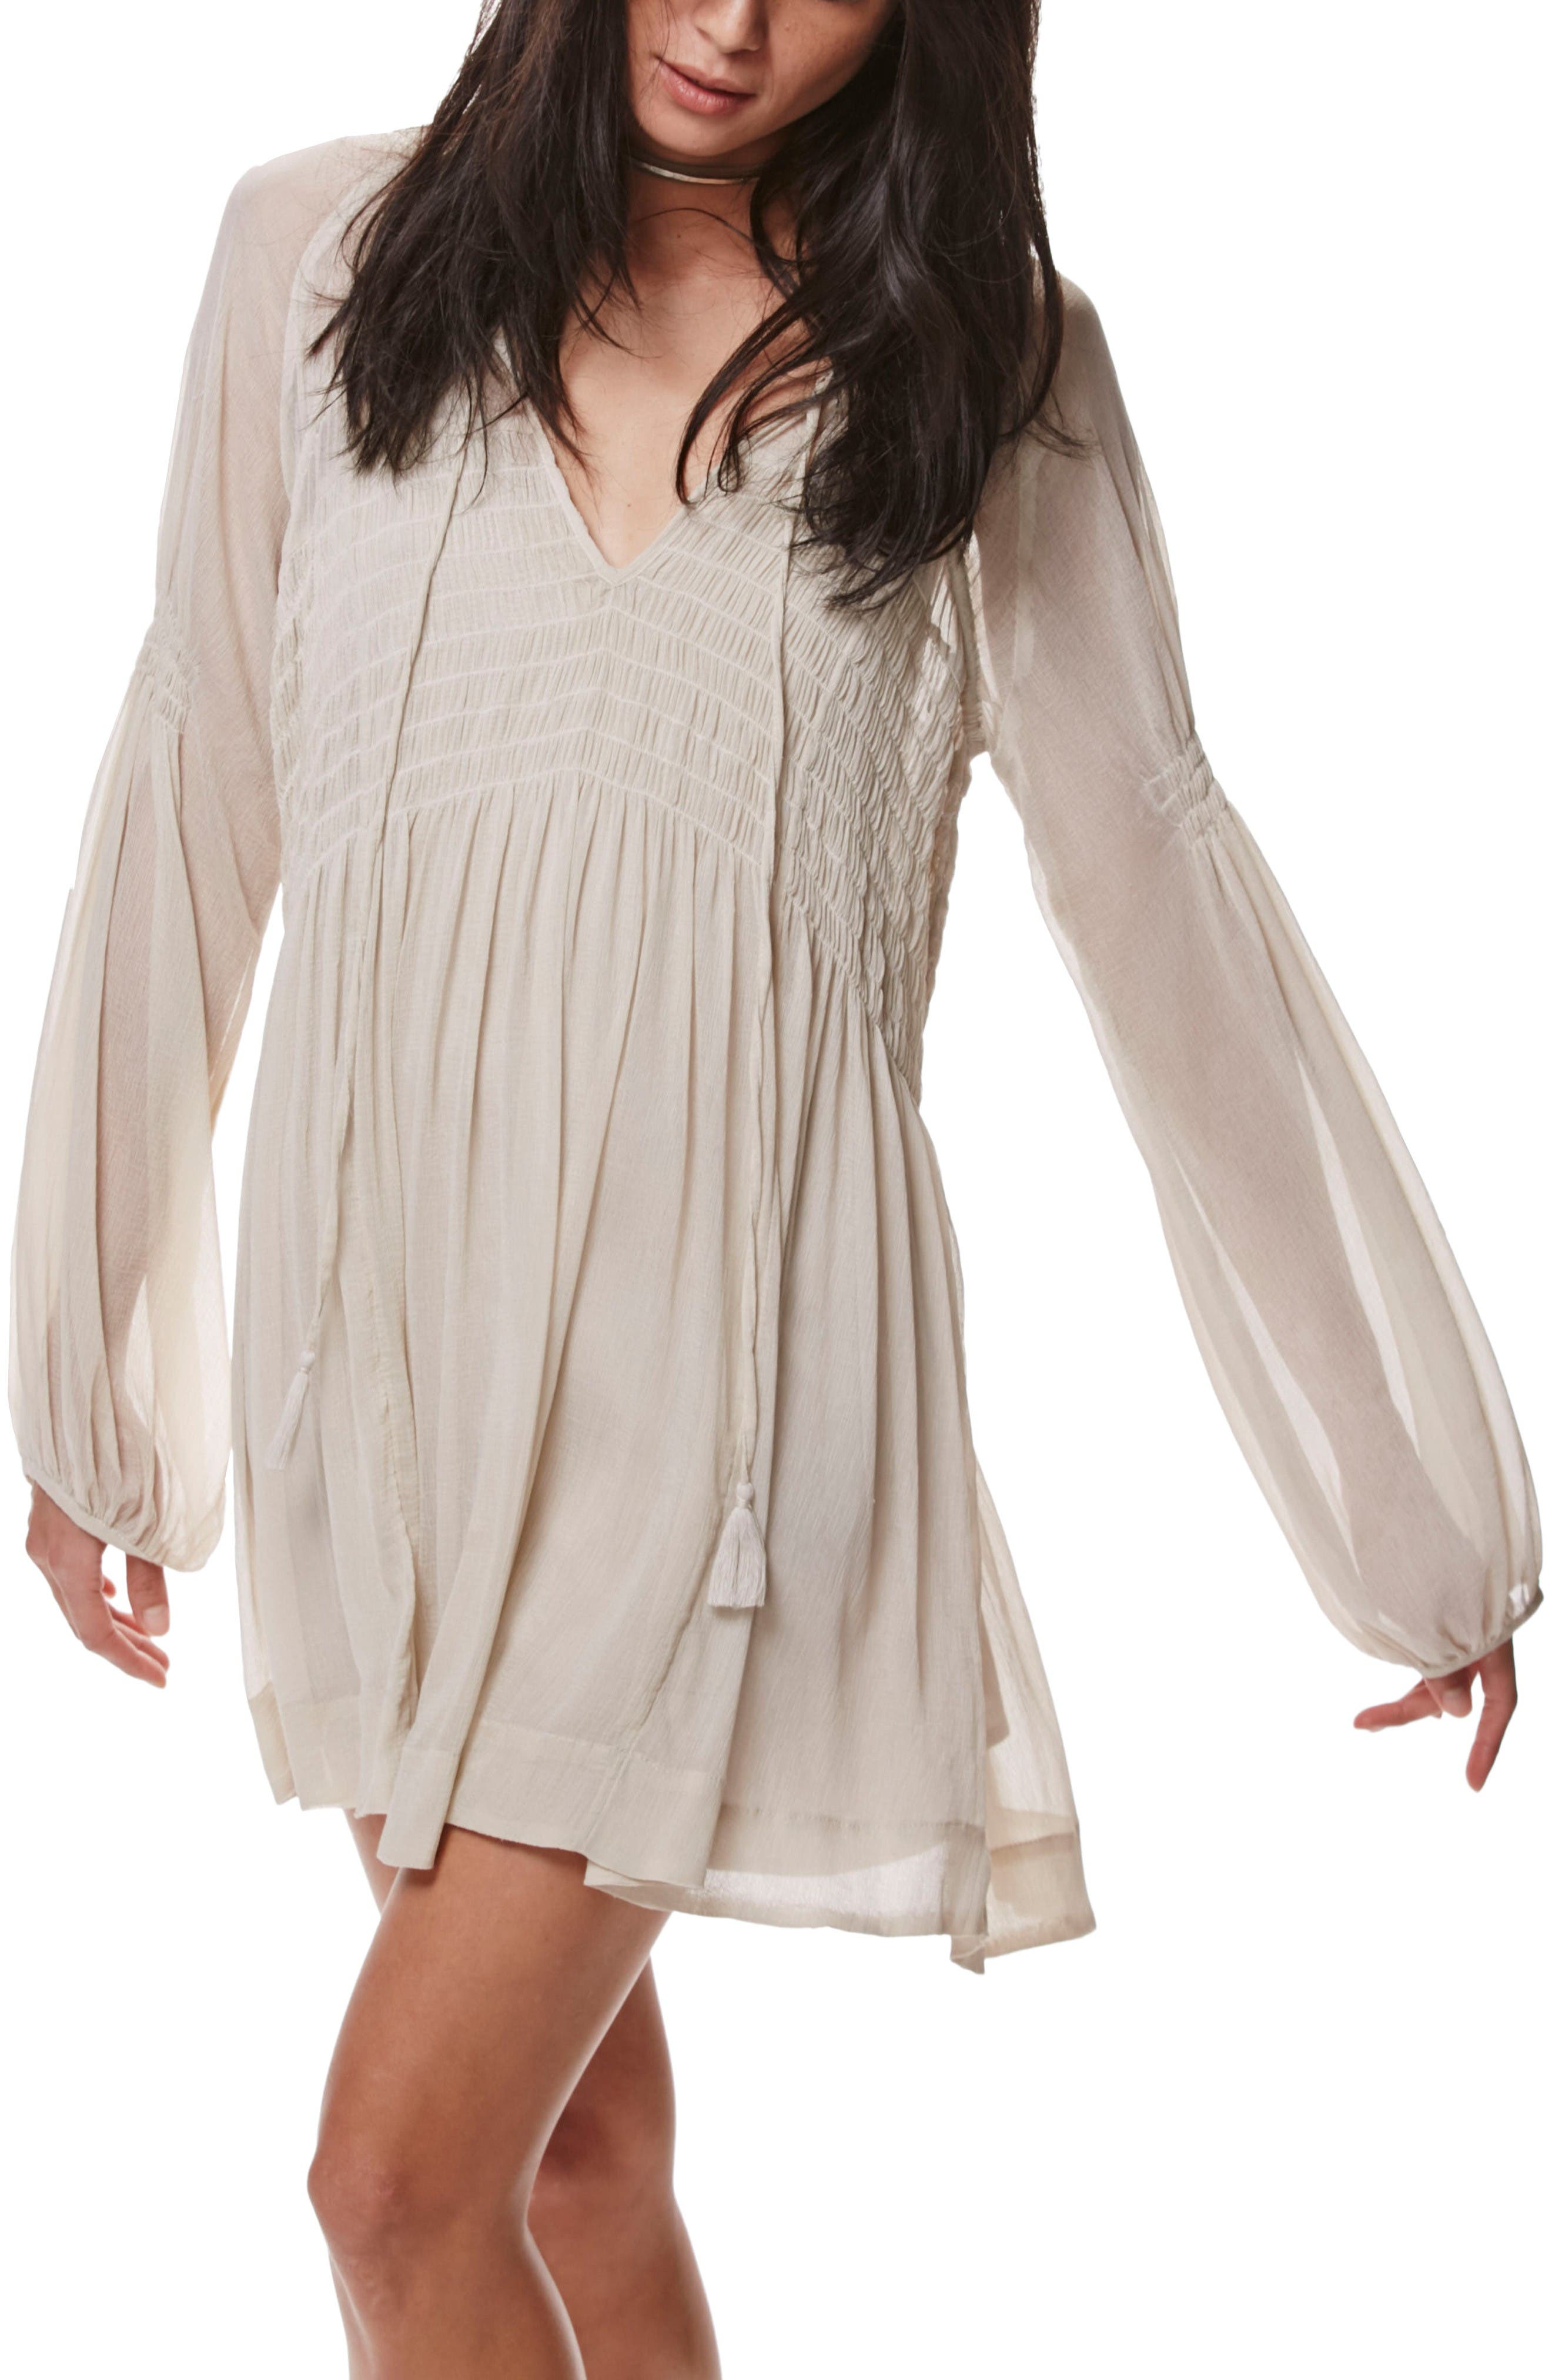 Alternate Image 1 Selected - Free People Lini Babydoll Dress